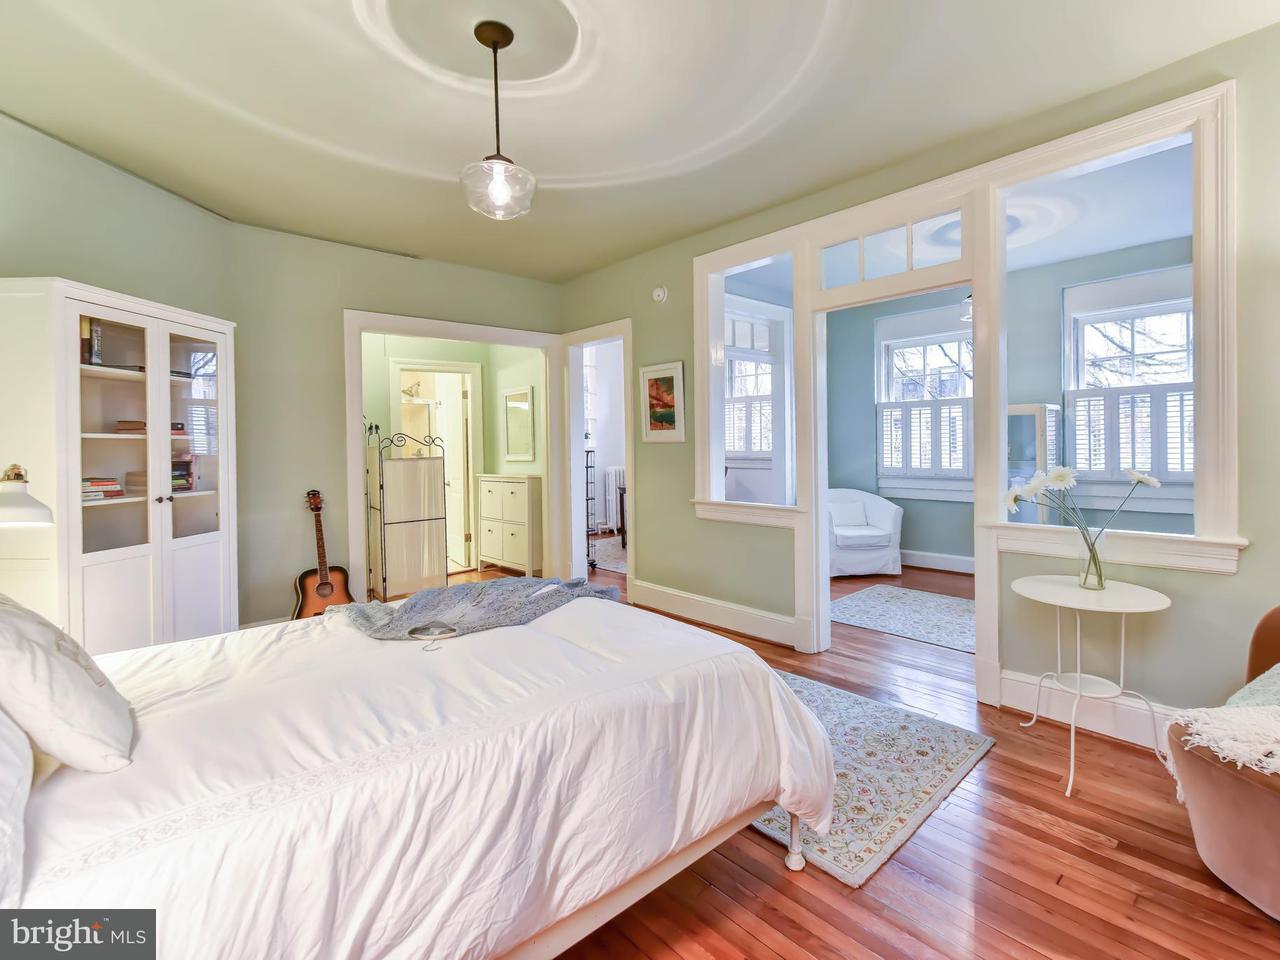 Condominium for Sale at 105 6th St SE #106 Washington, District Of Columbia 20003 United States